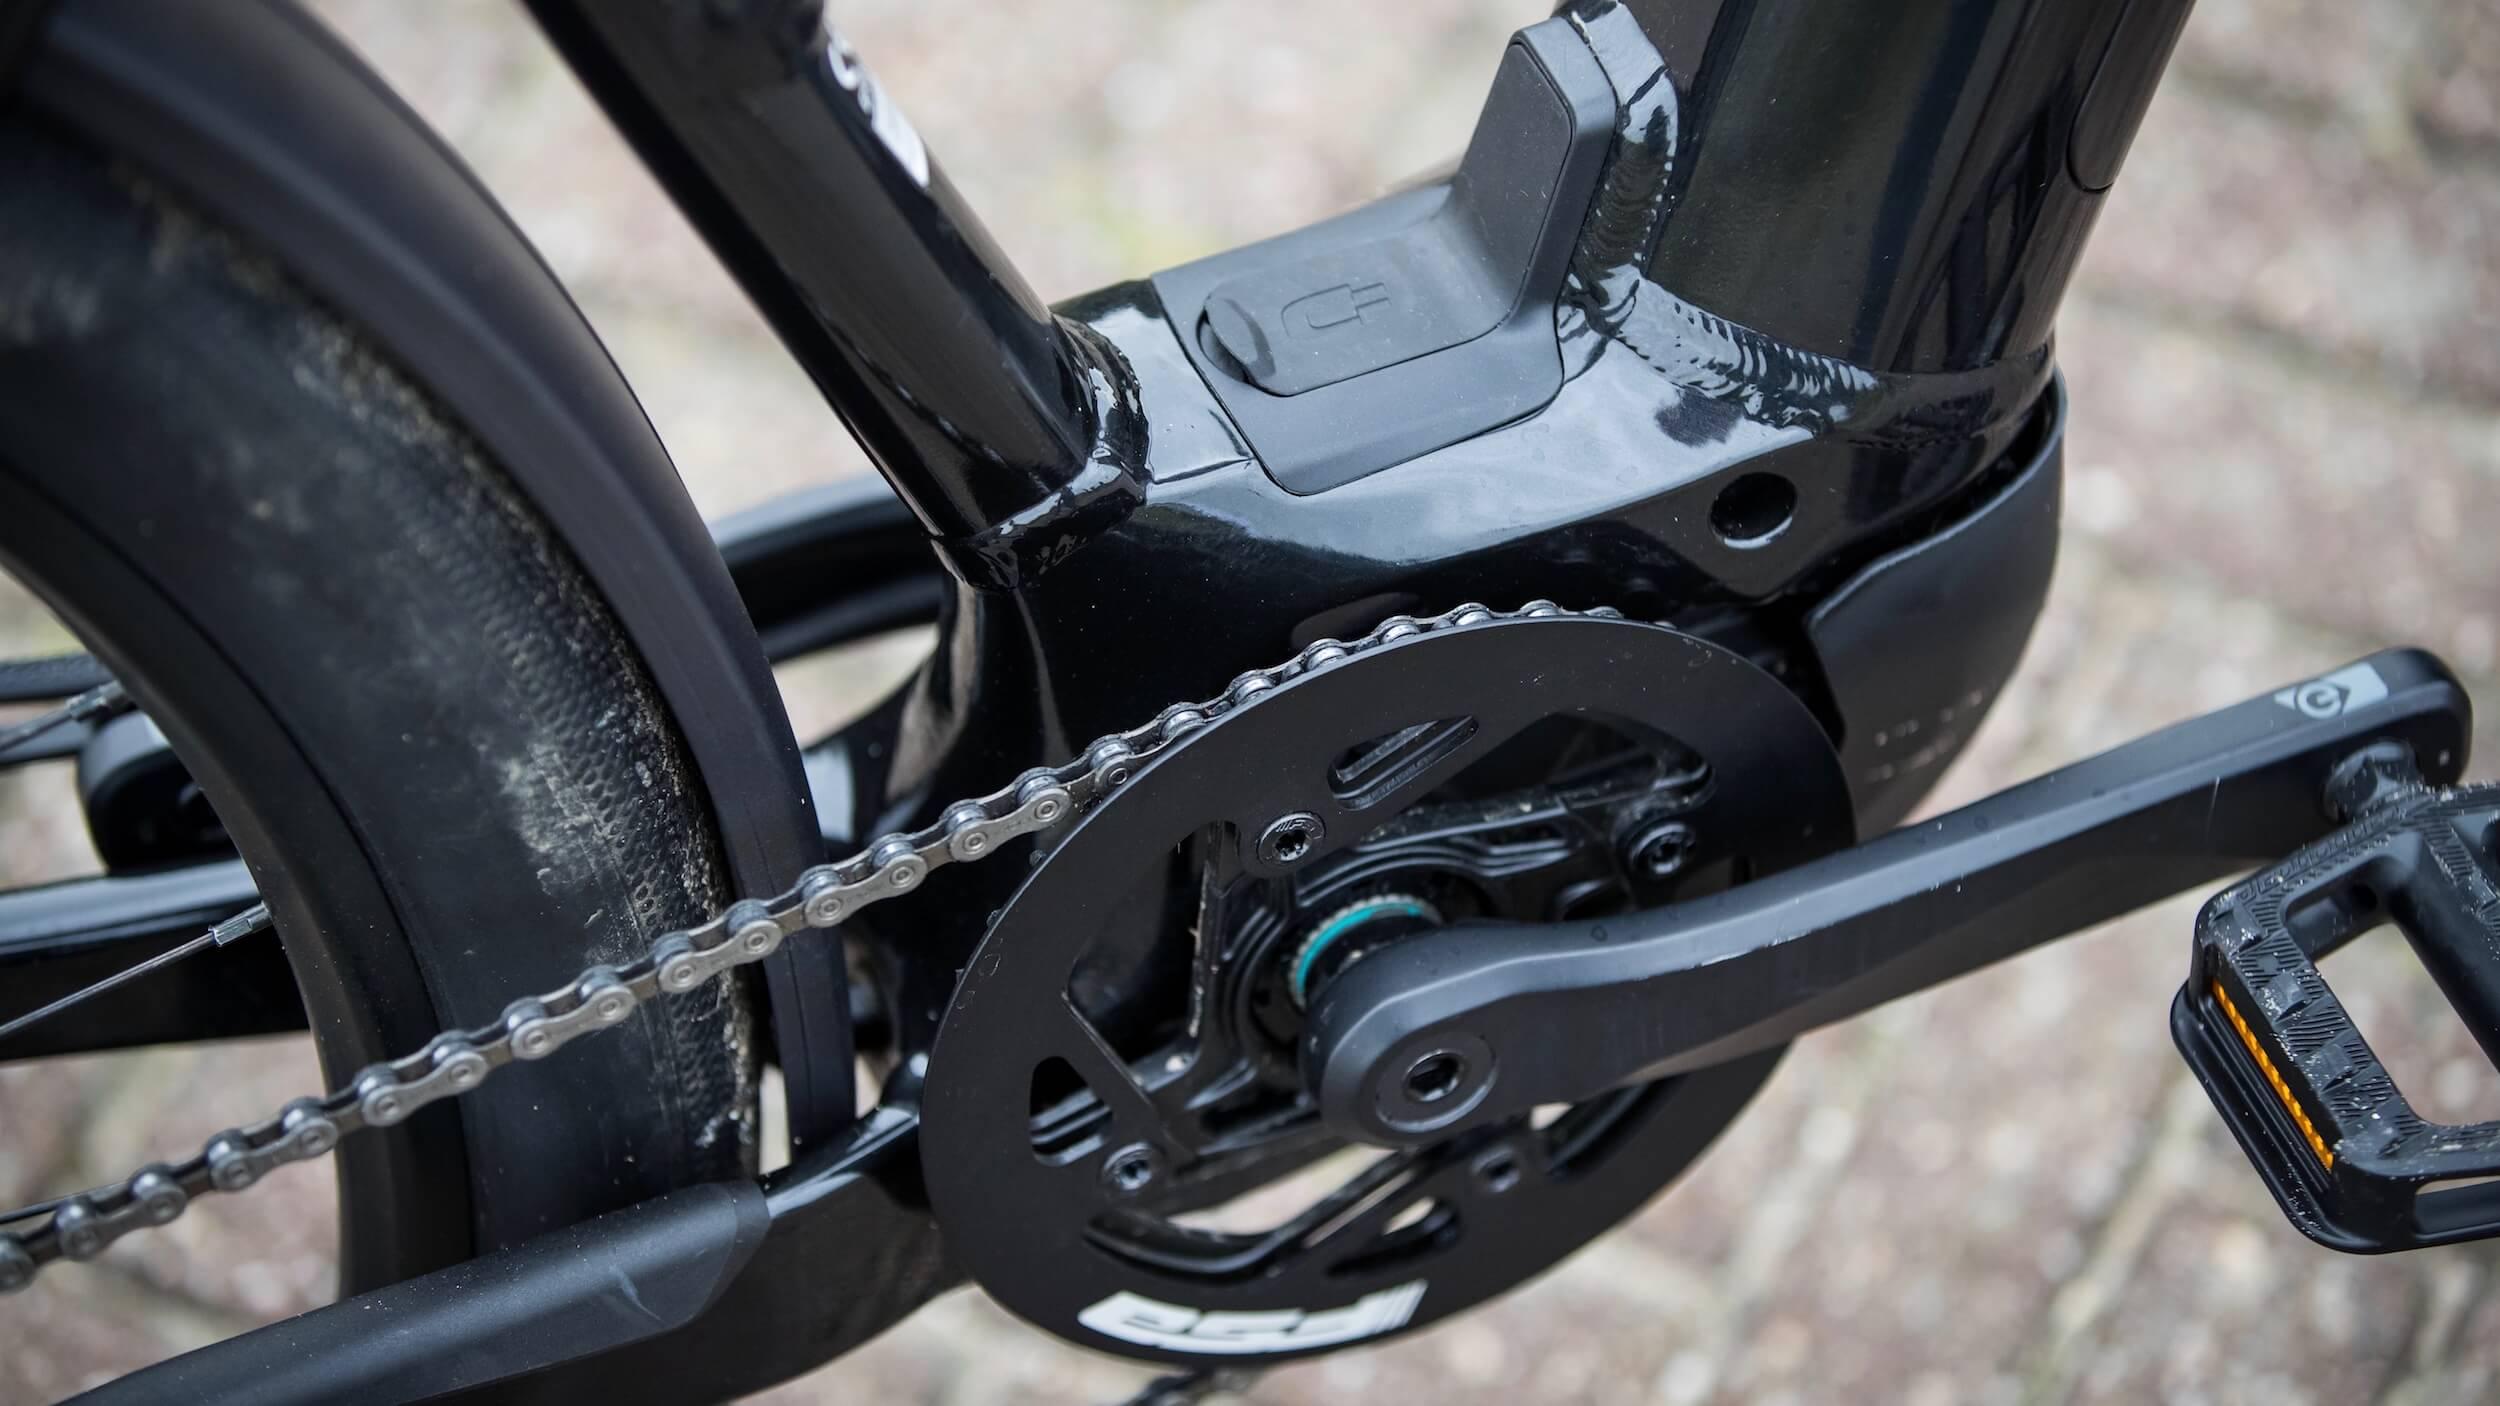 Cannondale Tesoro Neo X elektrische fiets